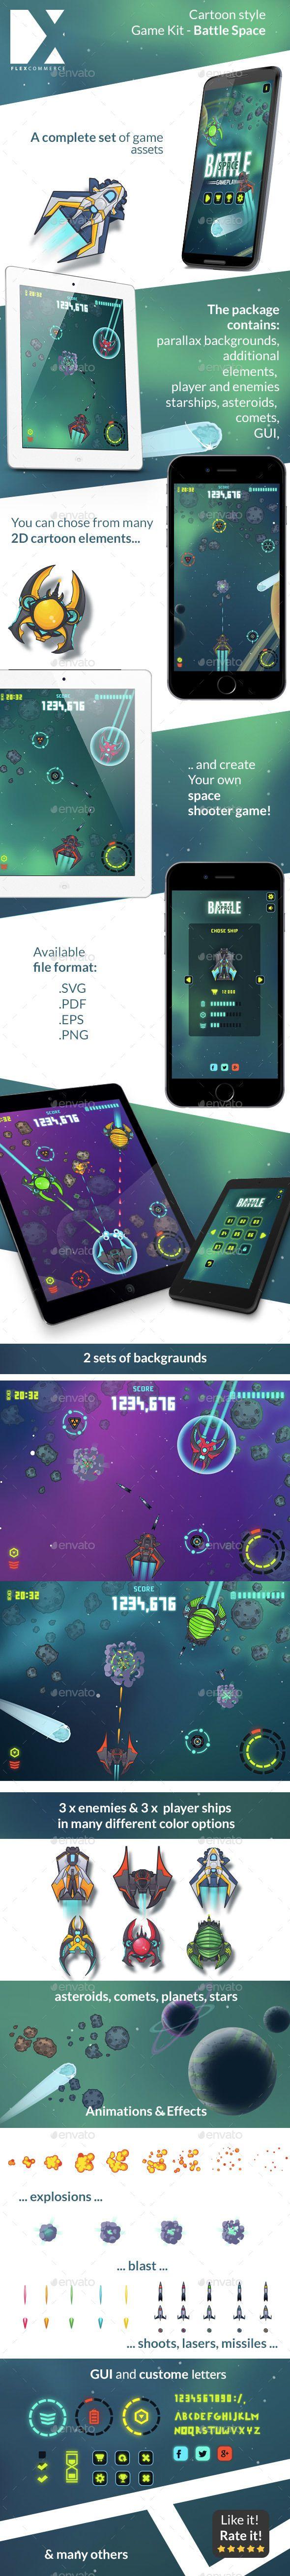 Battle Space - Game Kit (Game Kits)